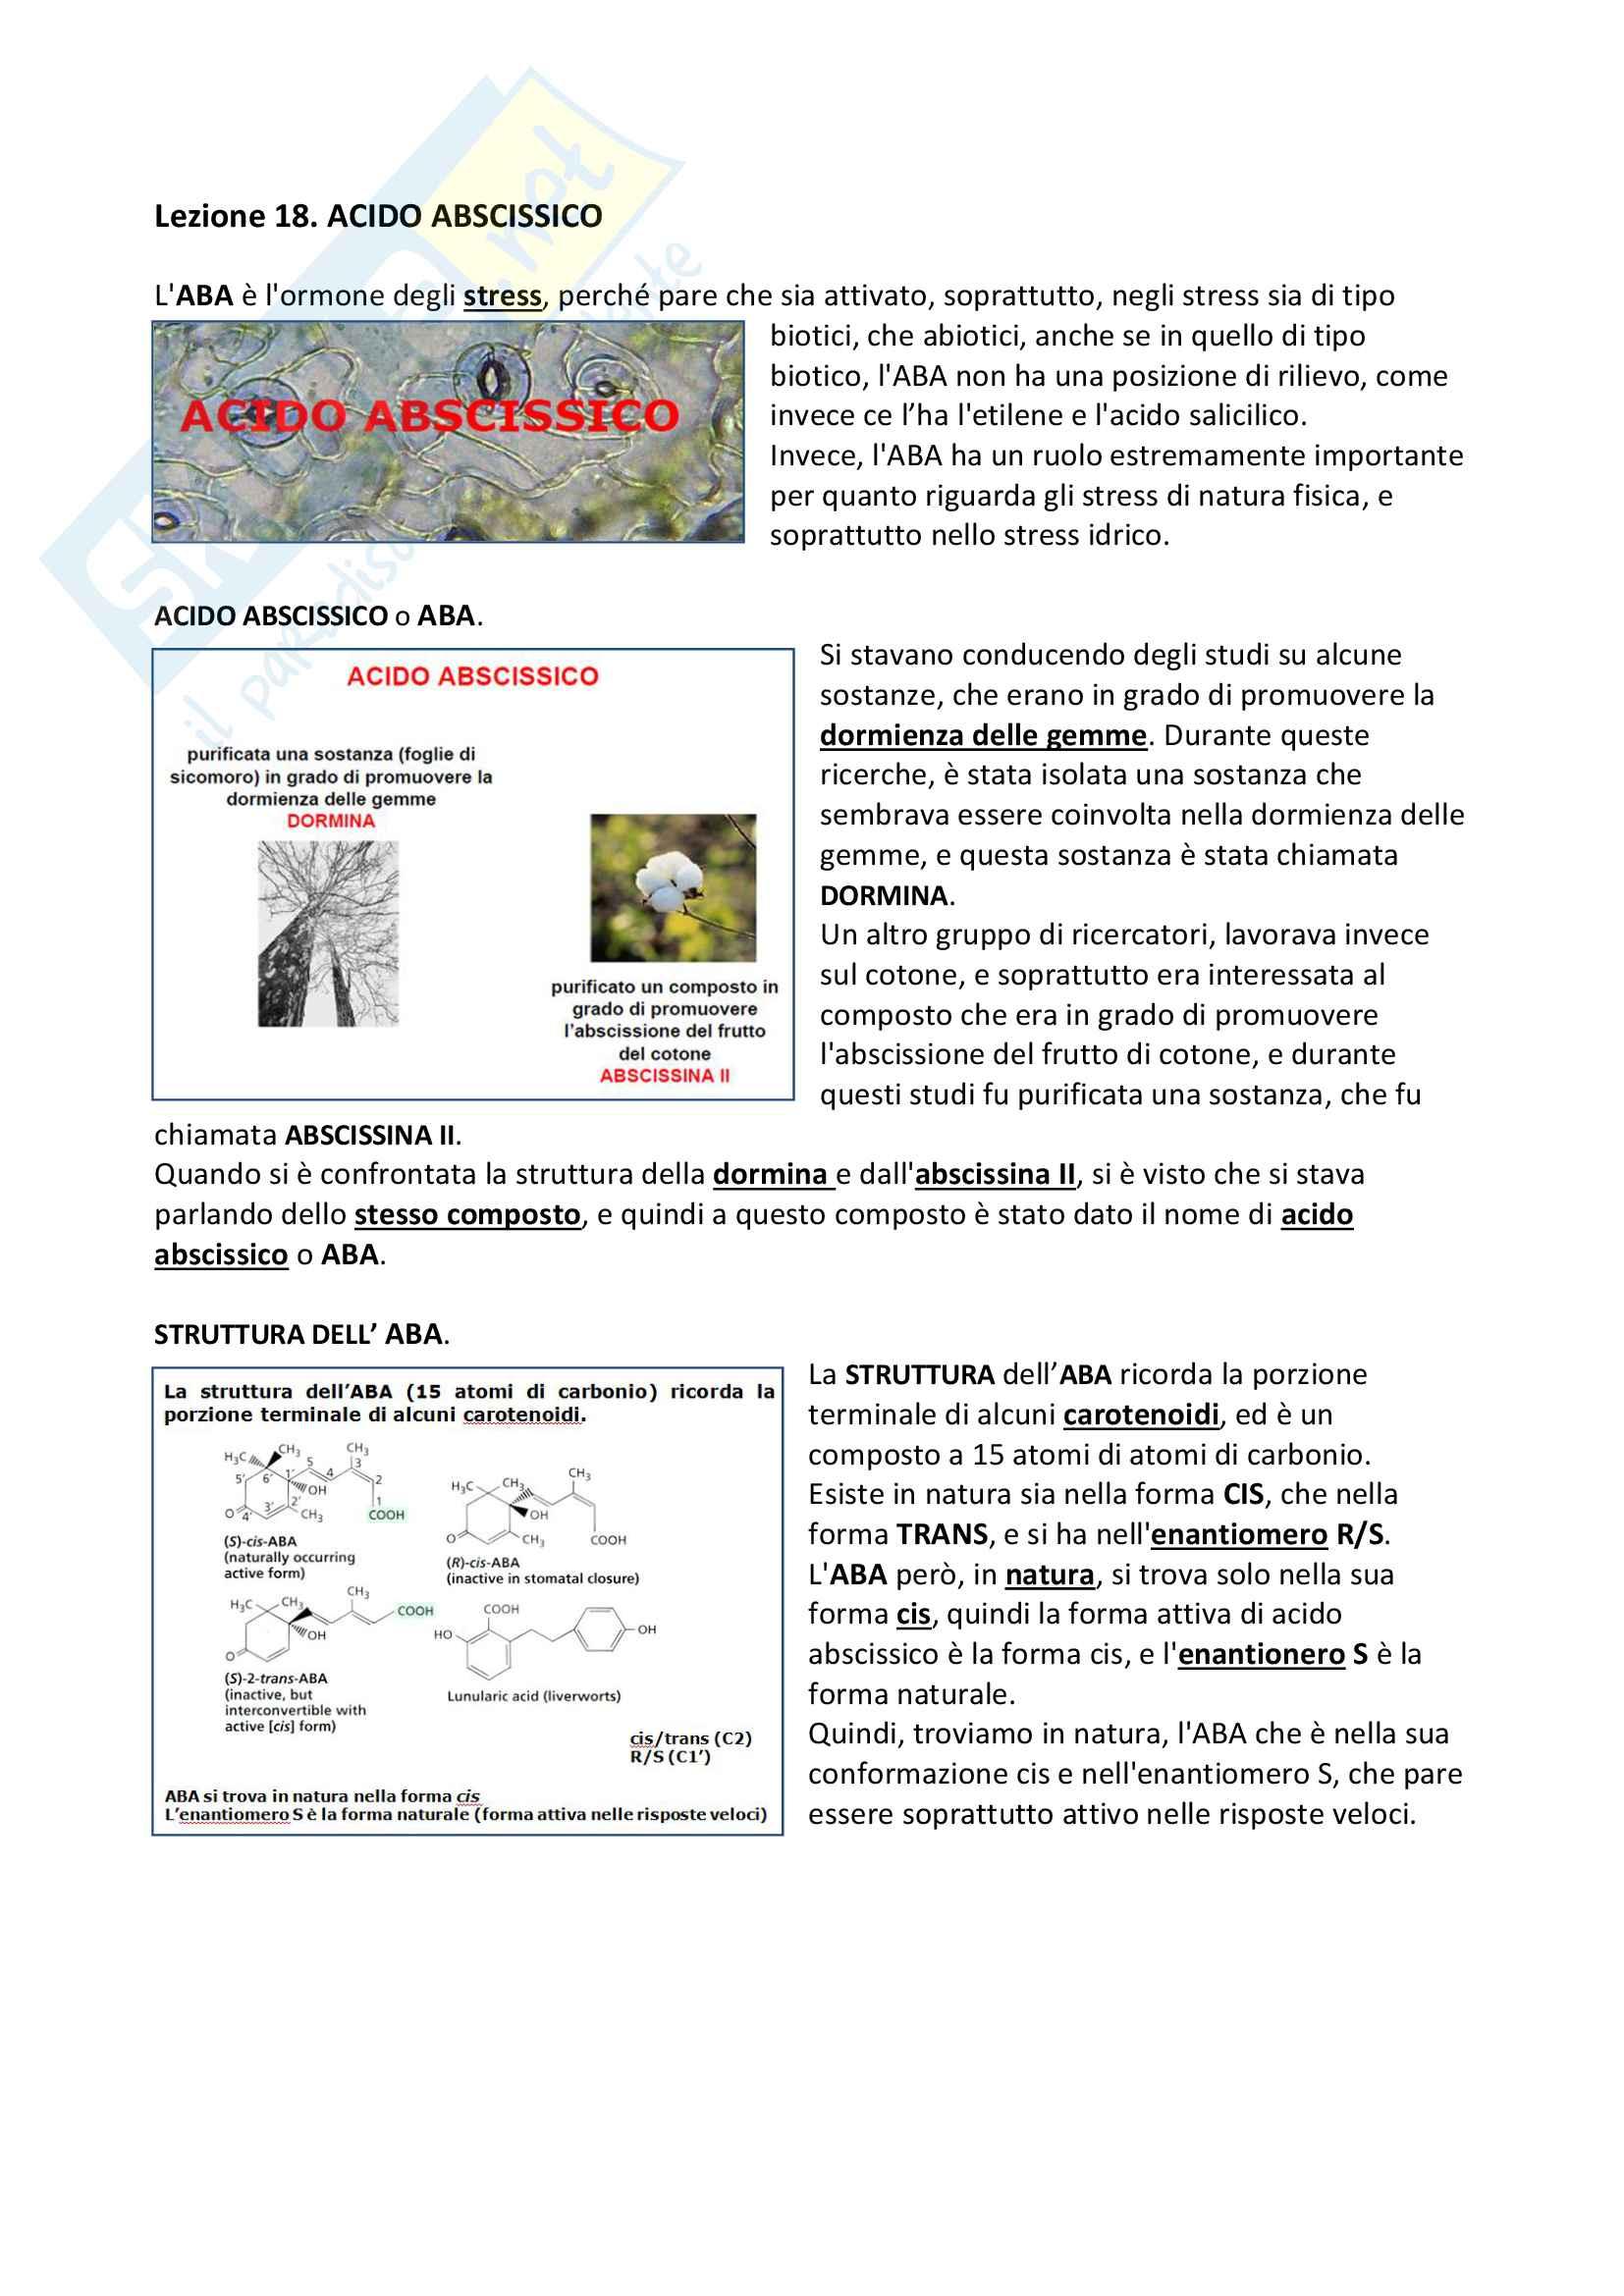 18) Lezione Acido Abscissico